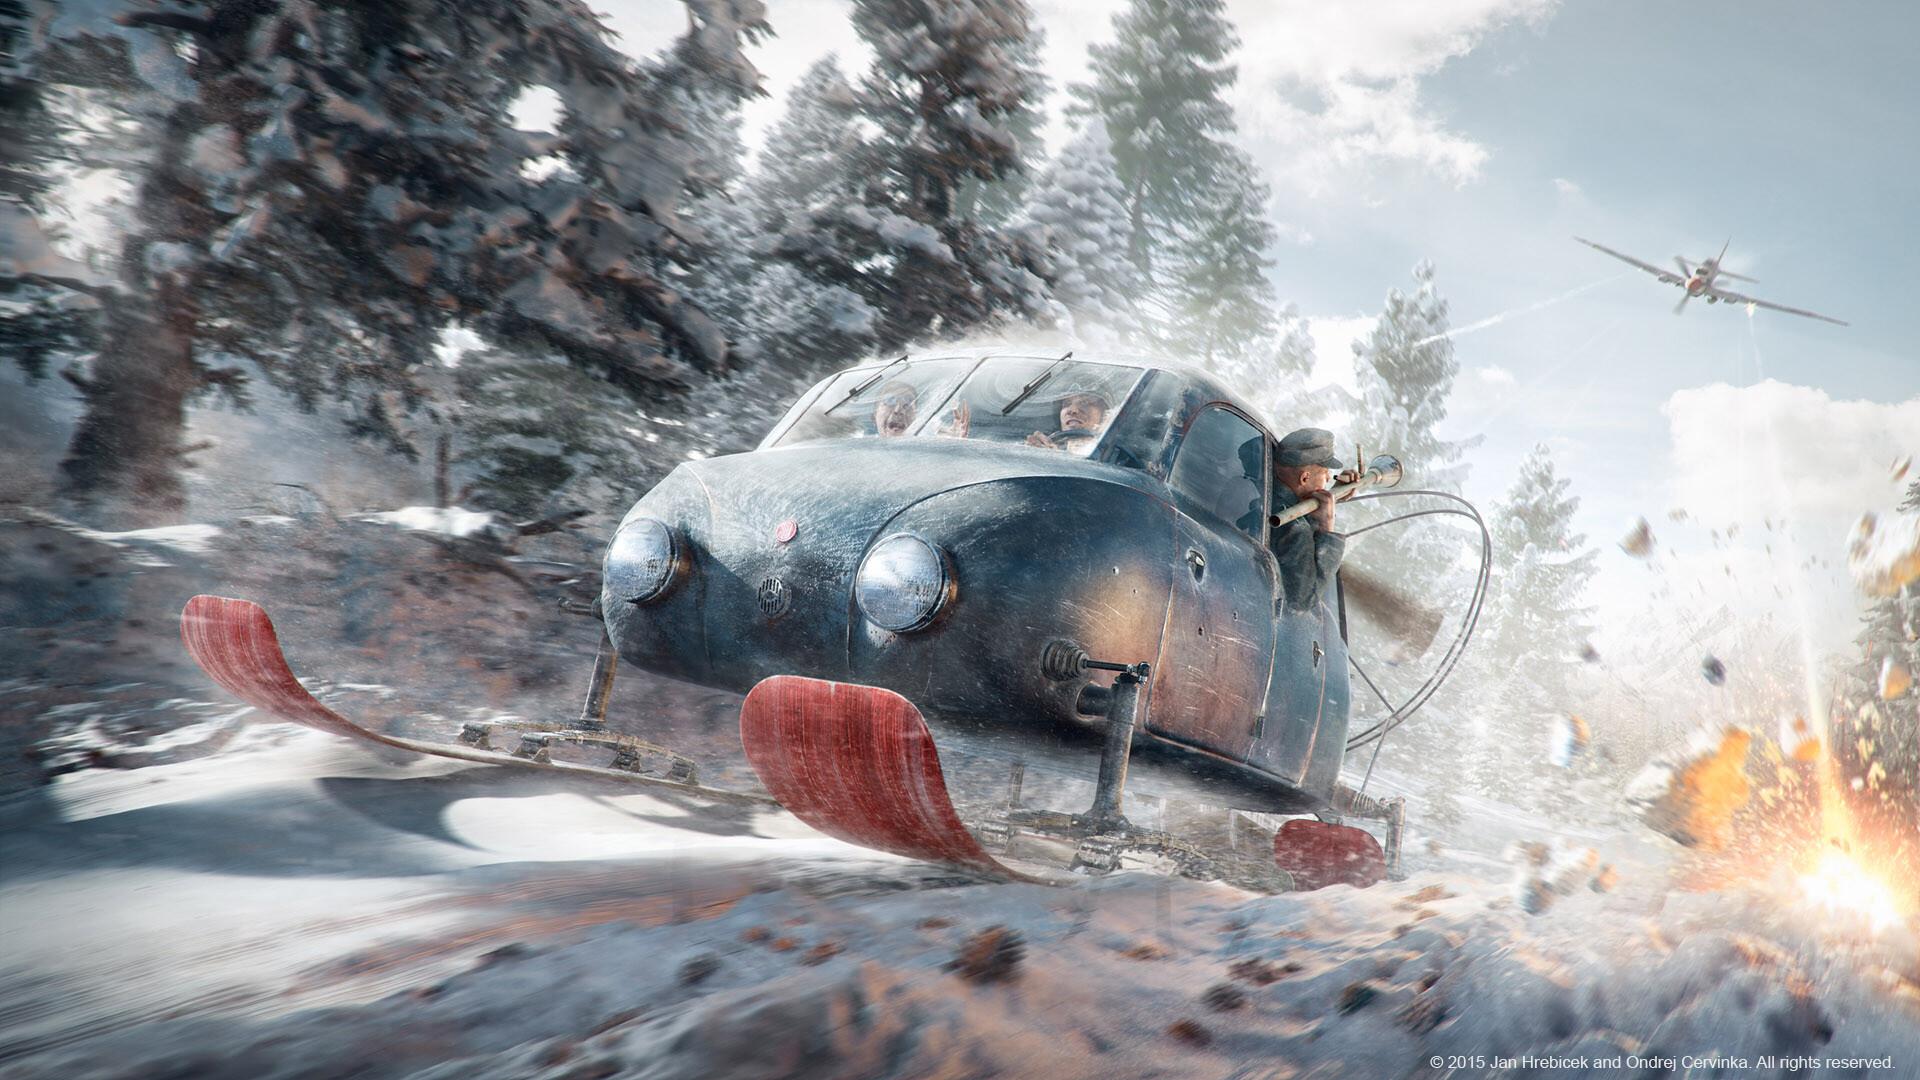 The Great Escape with Tatra V855